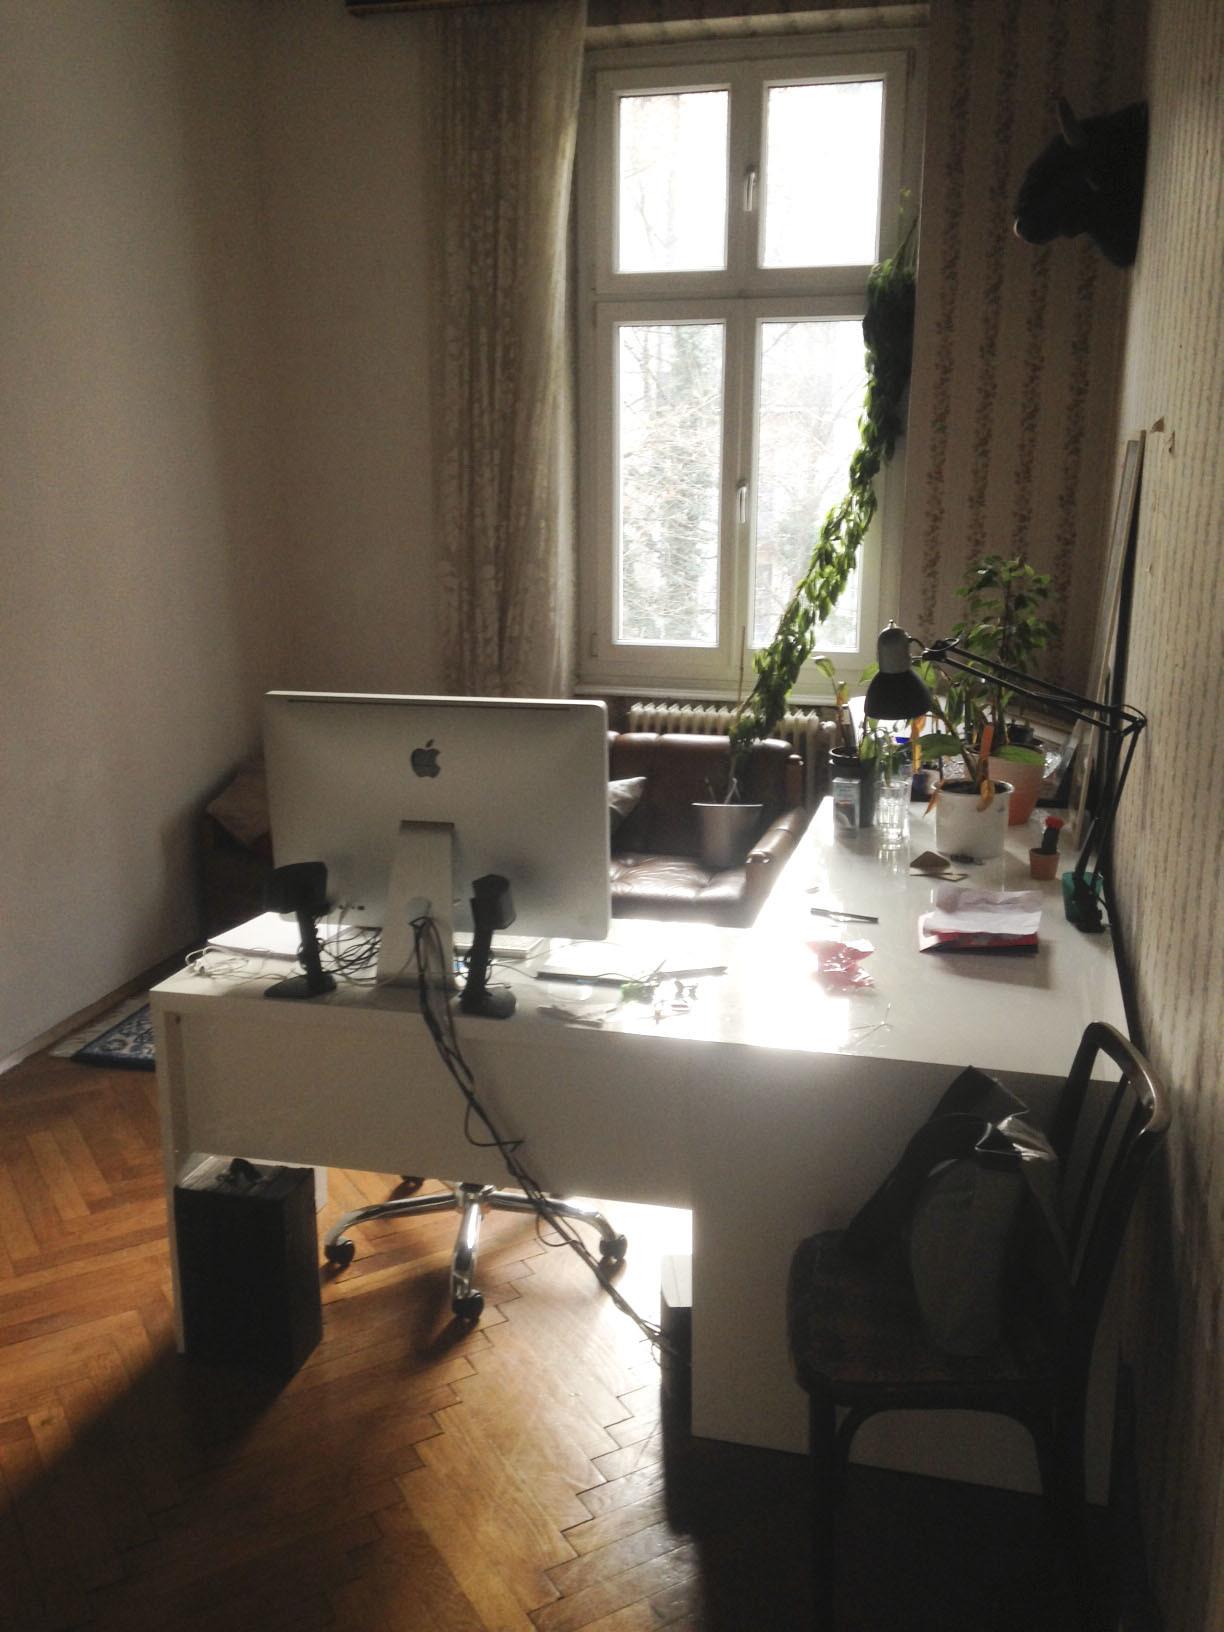 2-spacious-rooms-shared-4people-apartment-center-graz-4f25ed3dd4aa0f1fb888b3c01e737c69